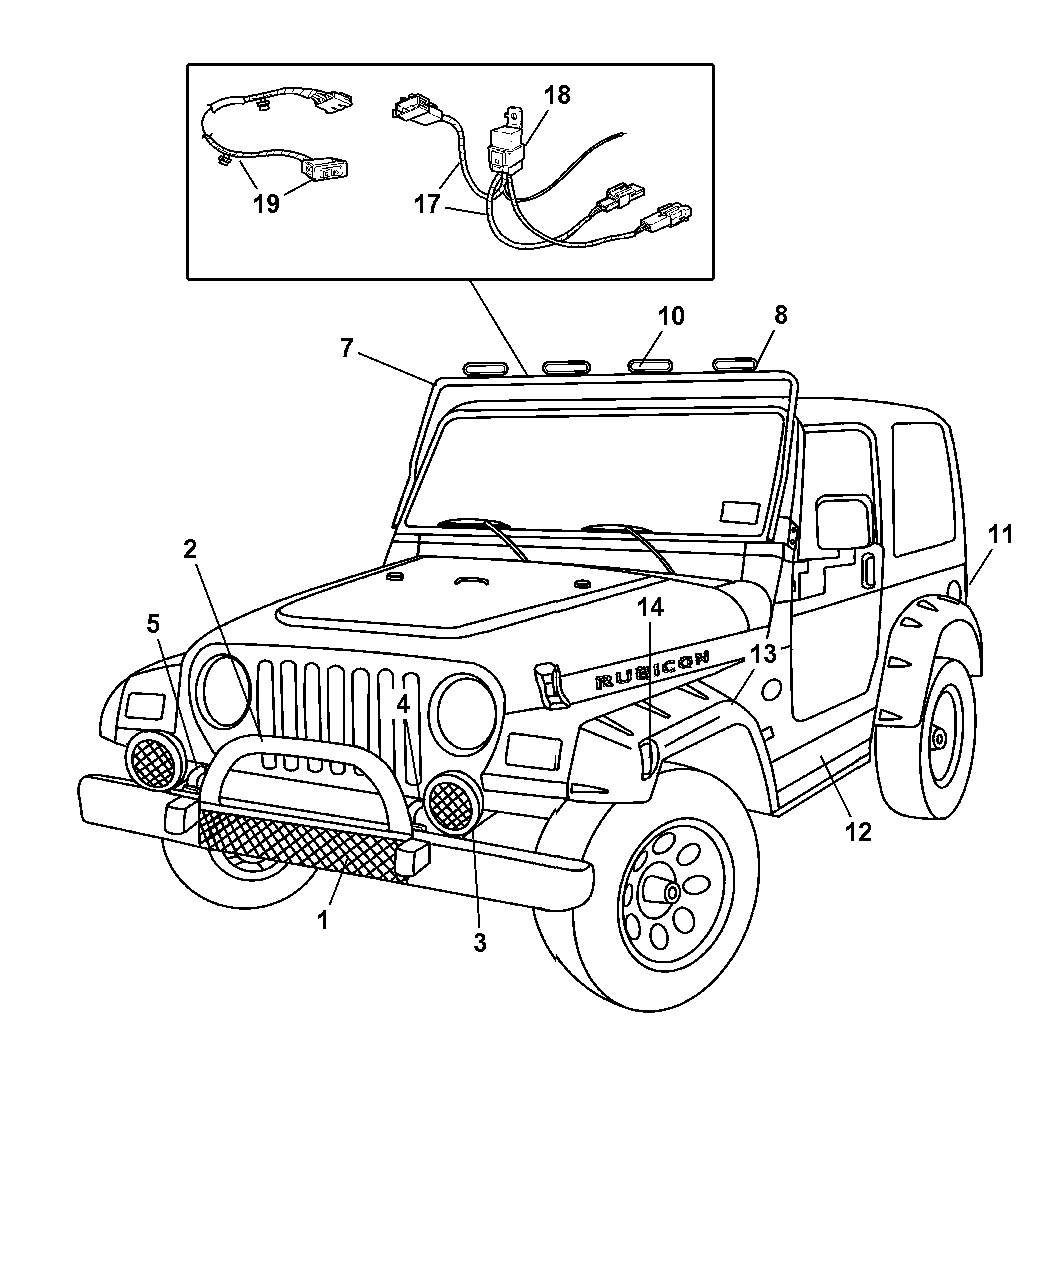 2003 jeep wrangler tomb raider edition